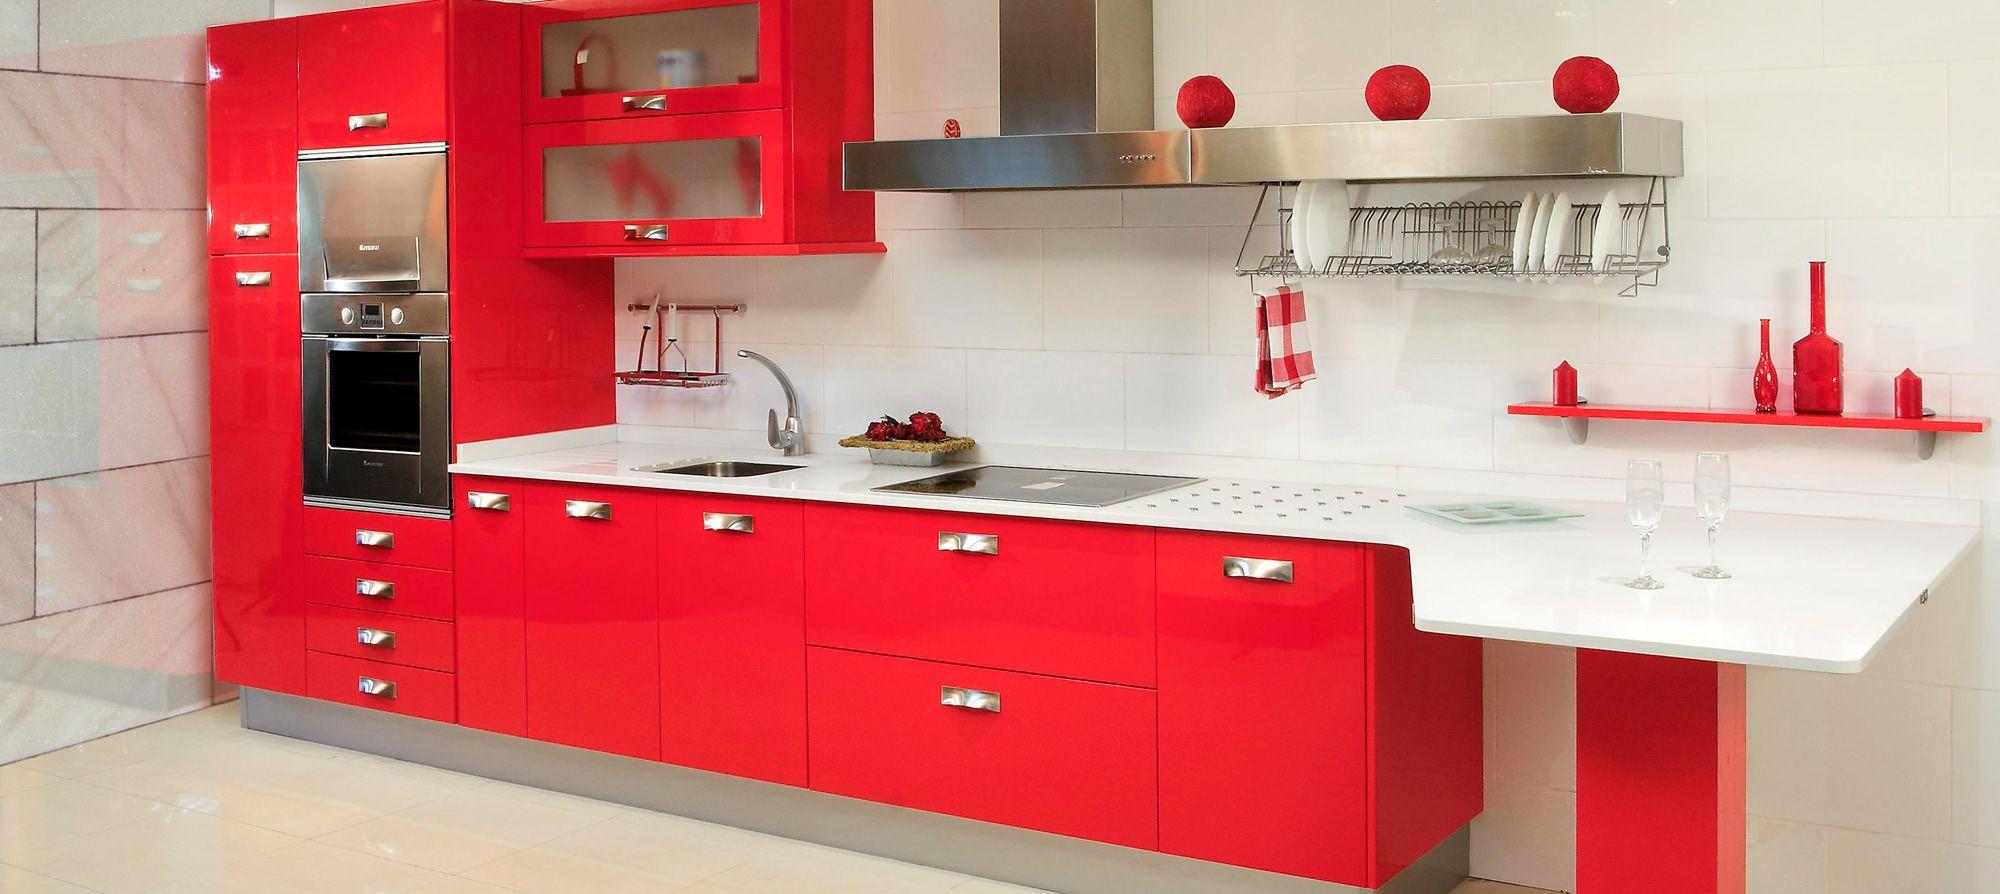 Resultado de imagen para cocinas integrales modernas para for Cocinas en espacios pequenos